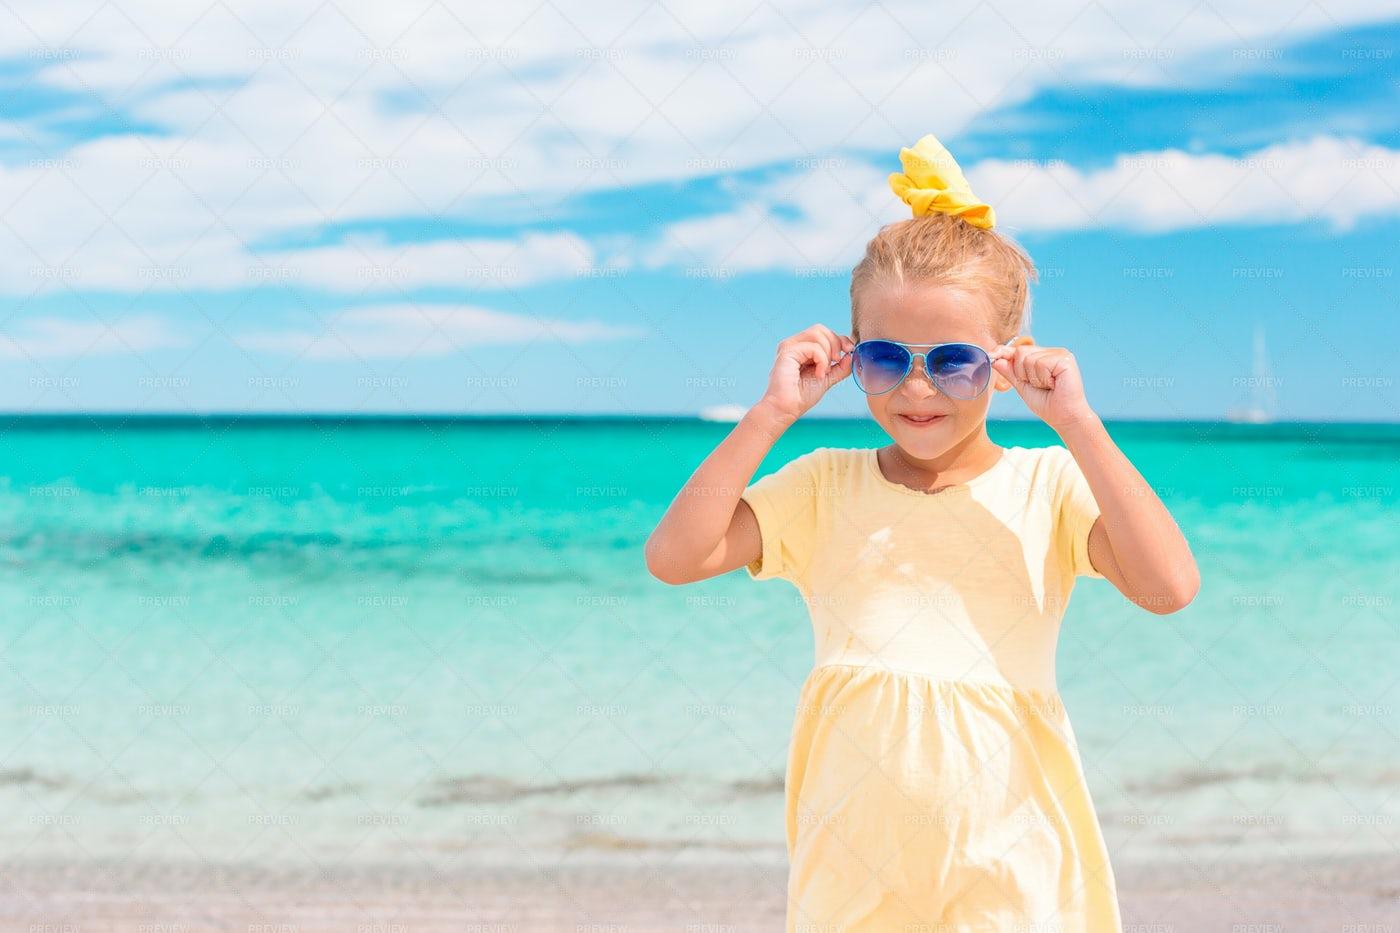 Beach Girl In Sunglasses: Stock Photos